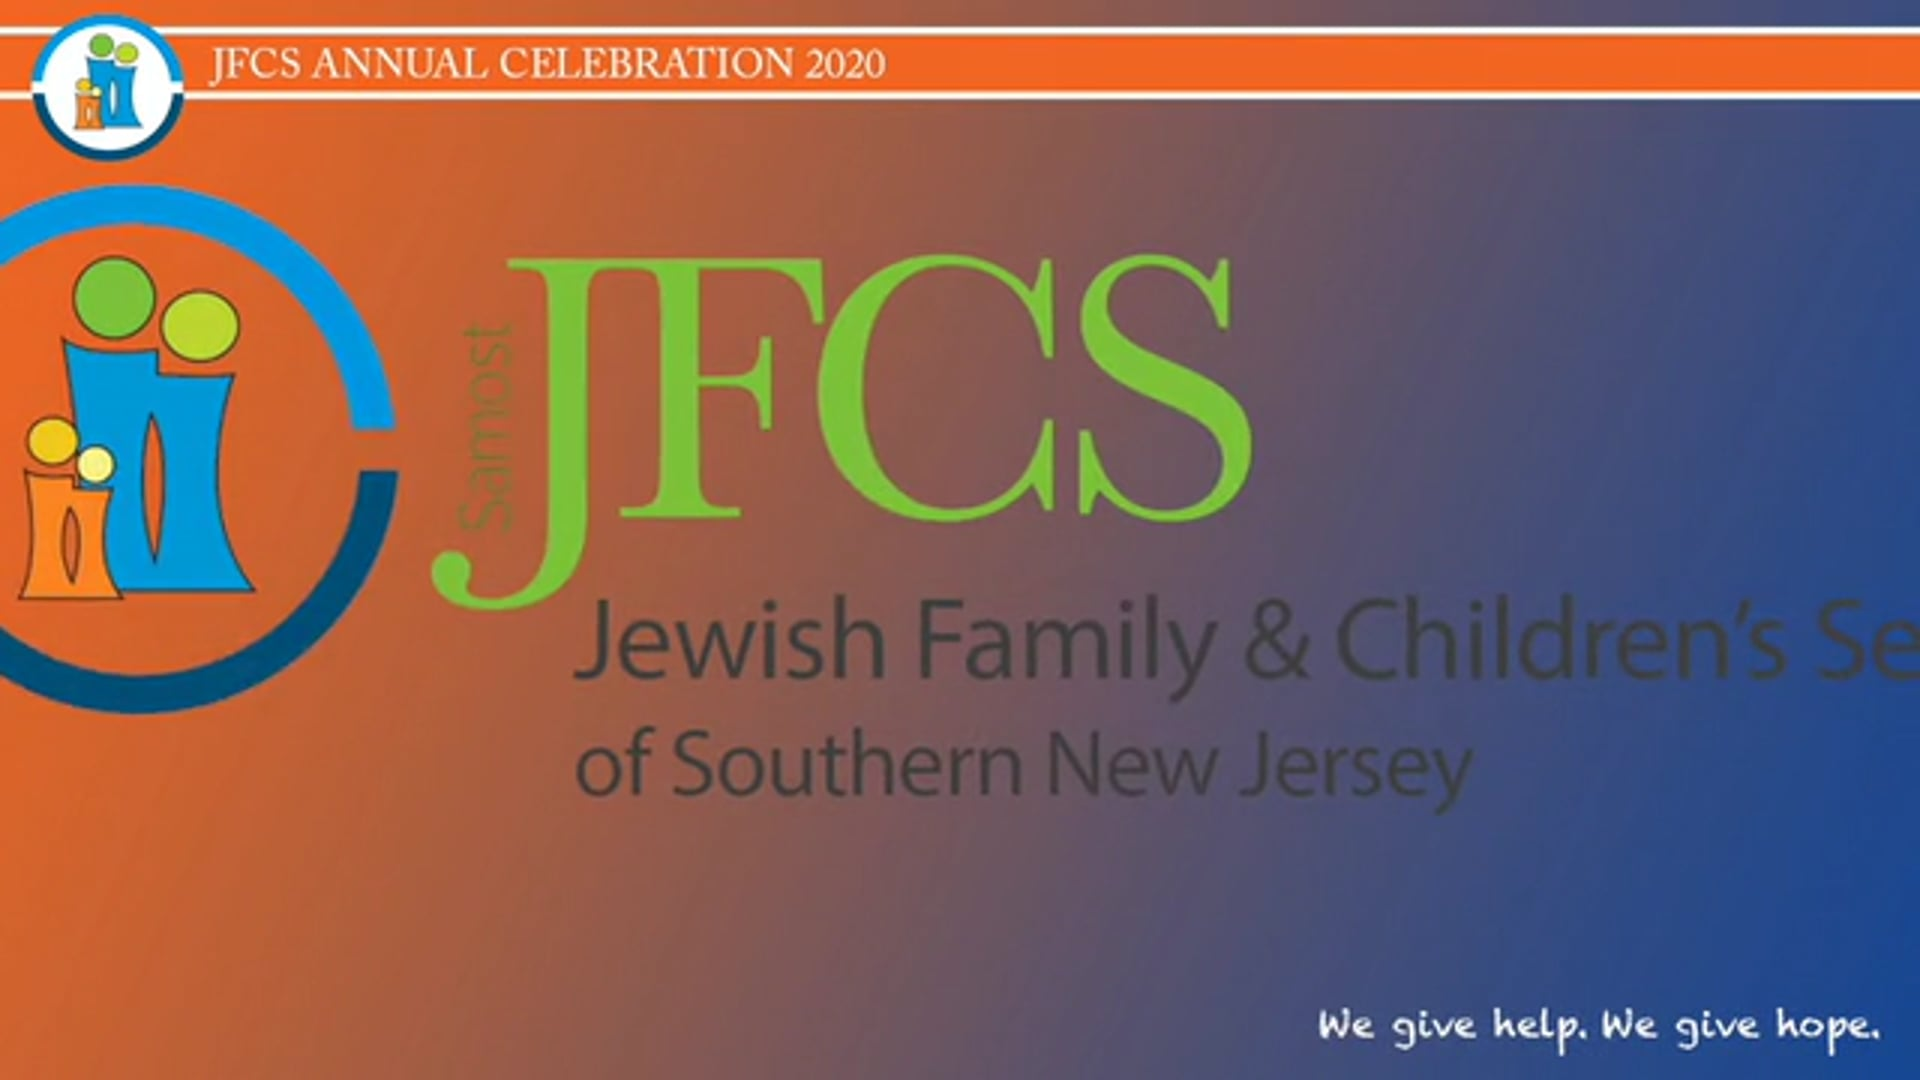 JFCS Annual Celebration